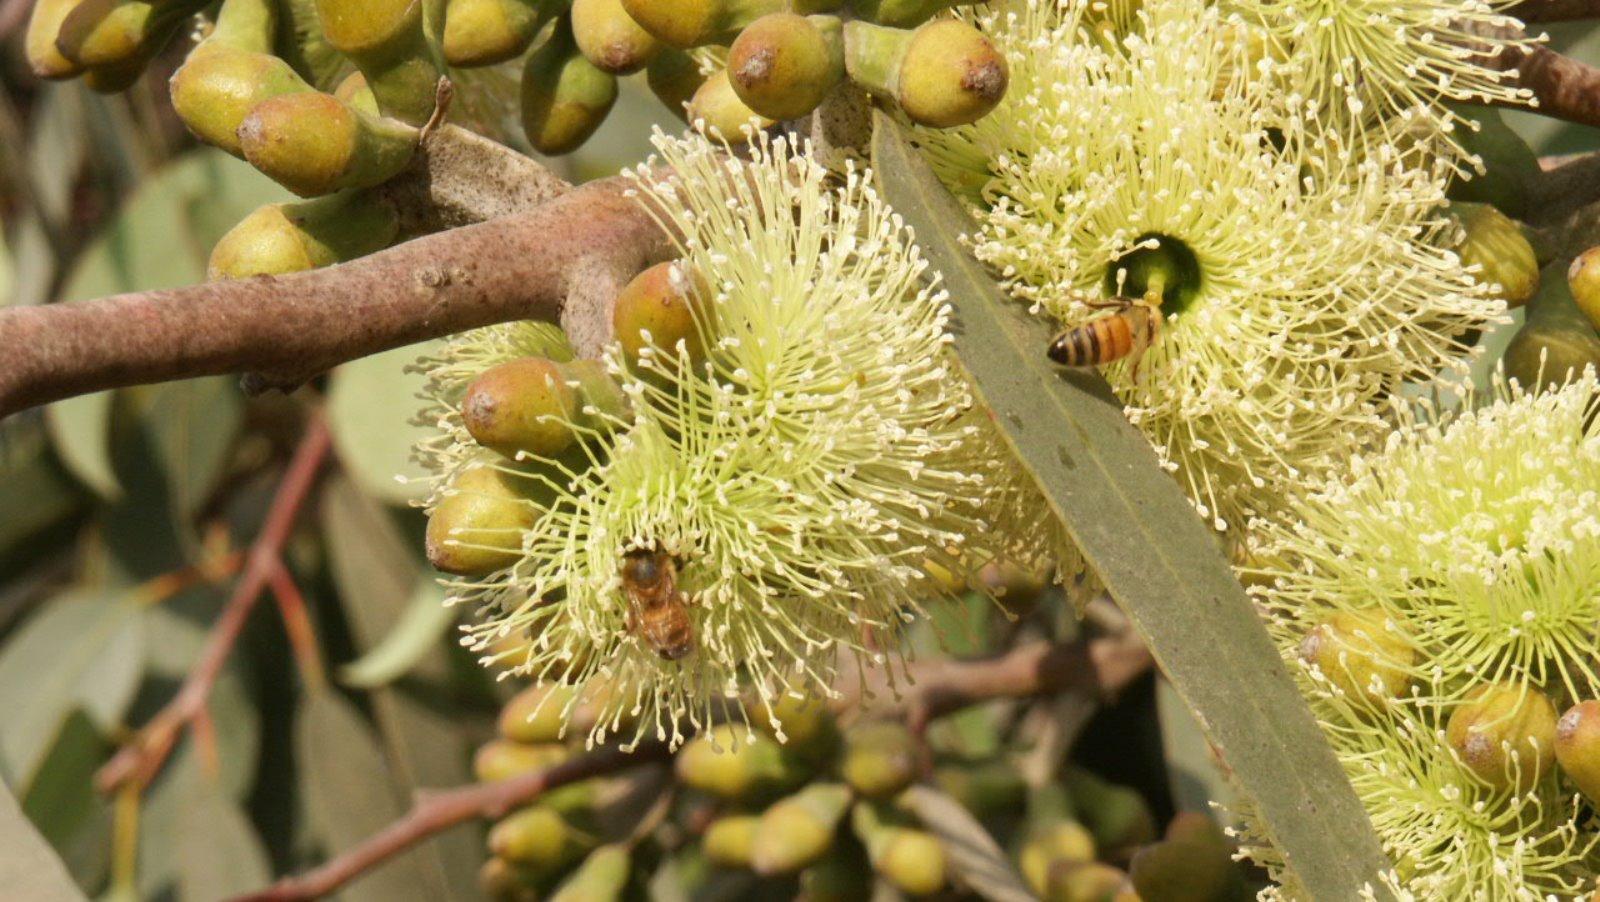 A honeybee feeding on a Eucalyptus Stricklandii (Strickland's Gum) tree. Photo by Gilat Nursery Director Pablo Chercasky/KKL-JNF